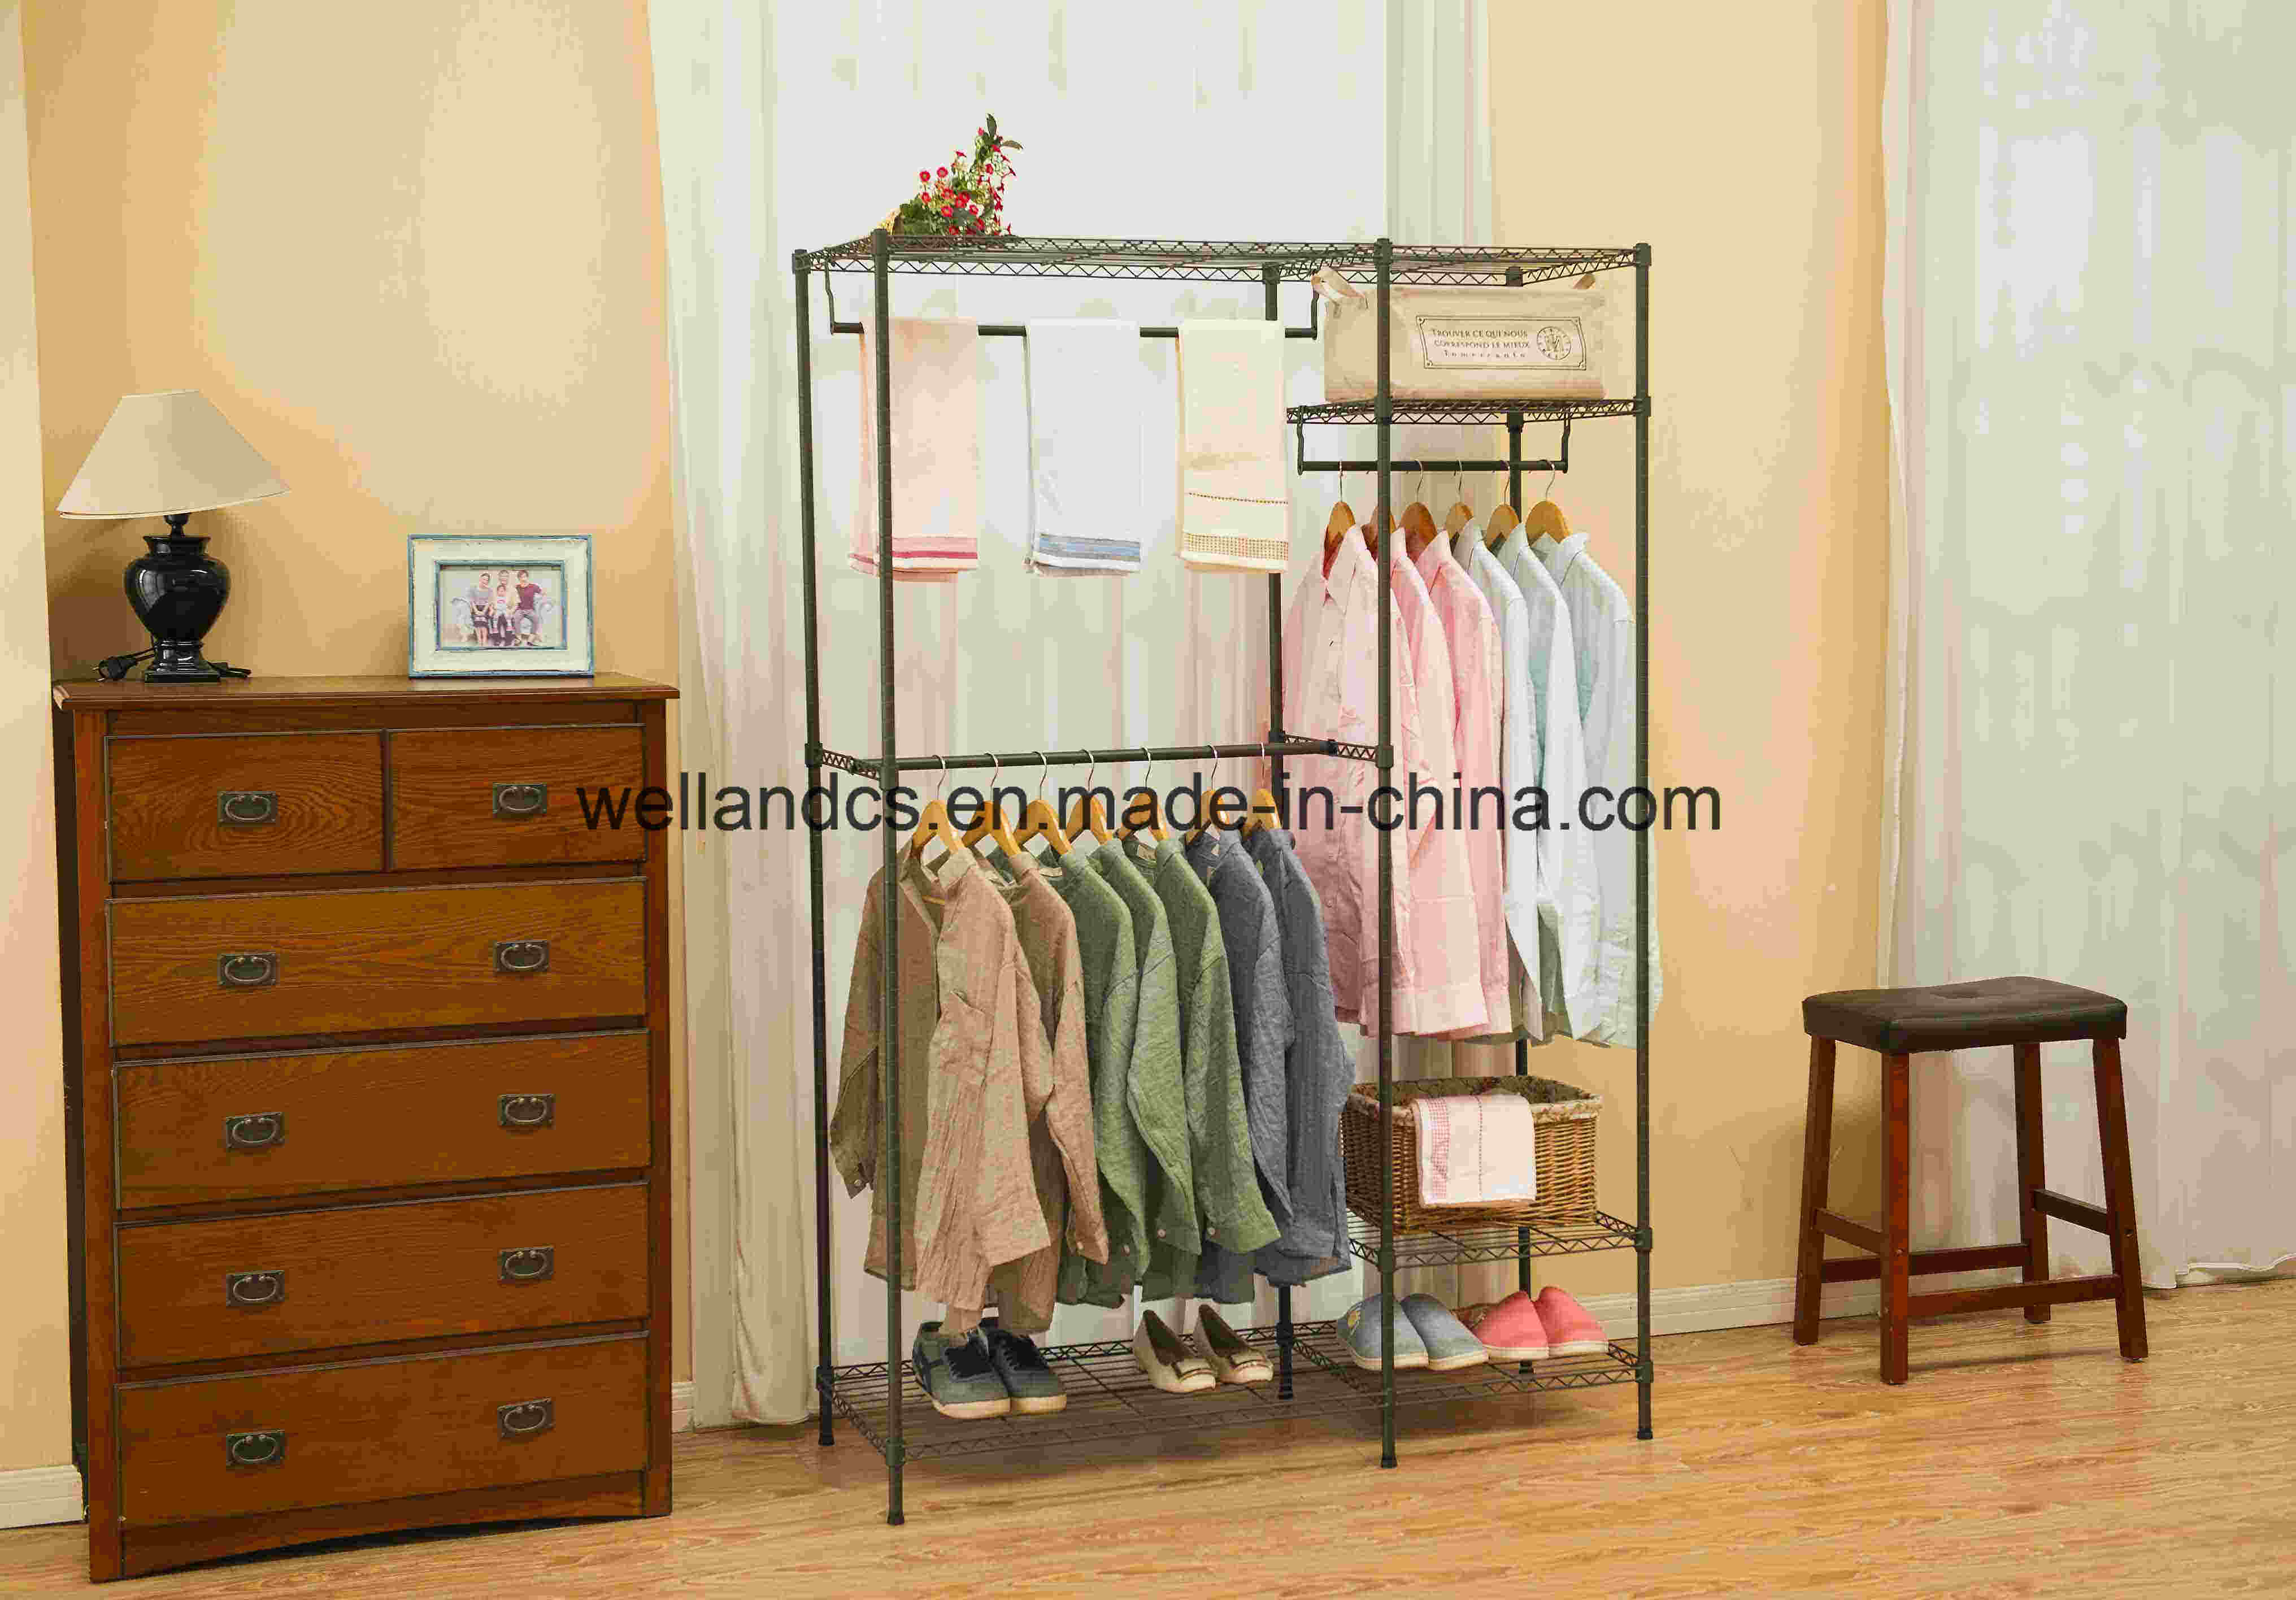 wardrobe industrial design vintage locker sq metal iron steel cabinet